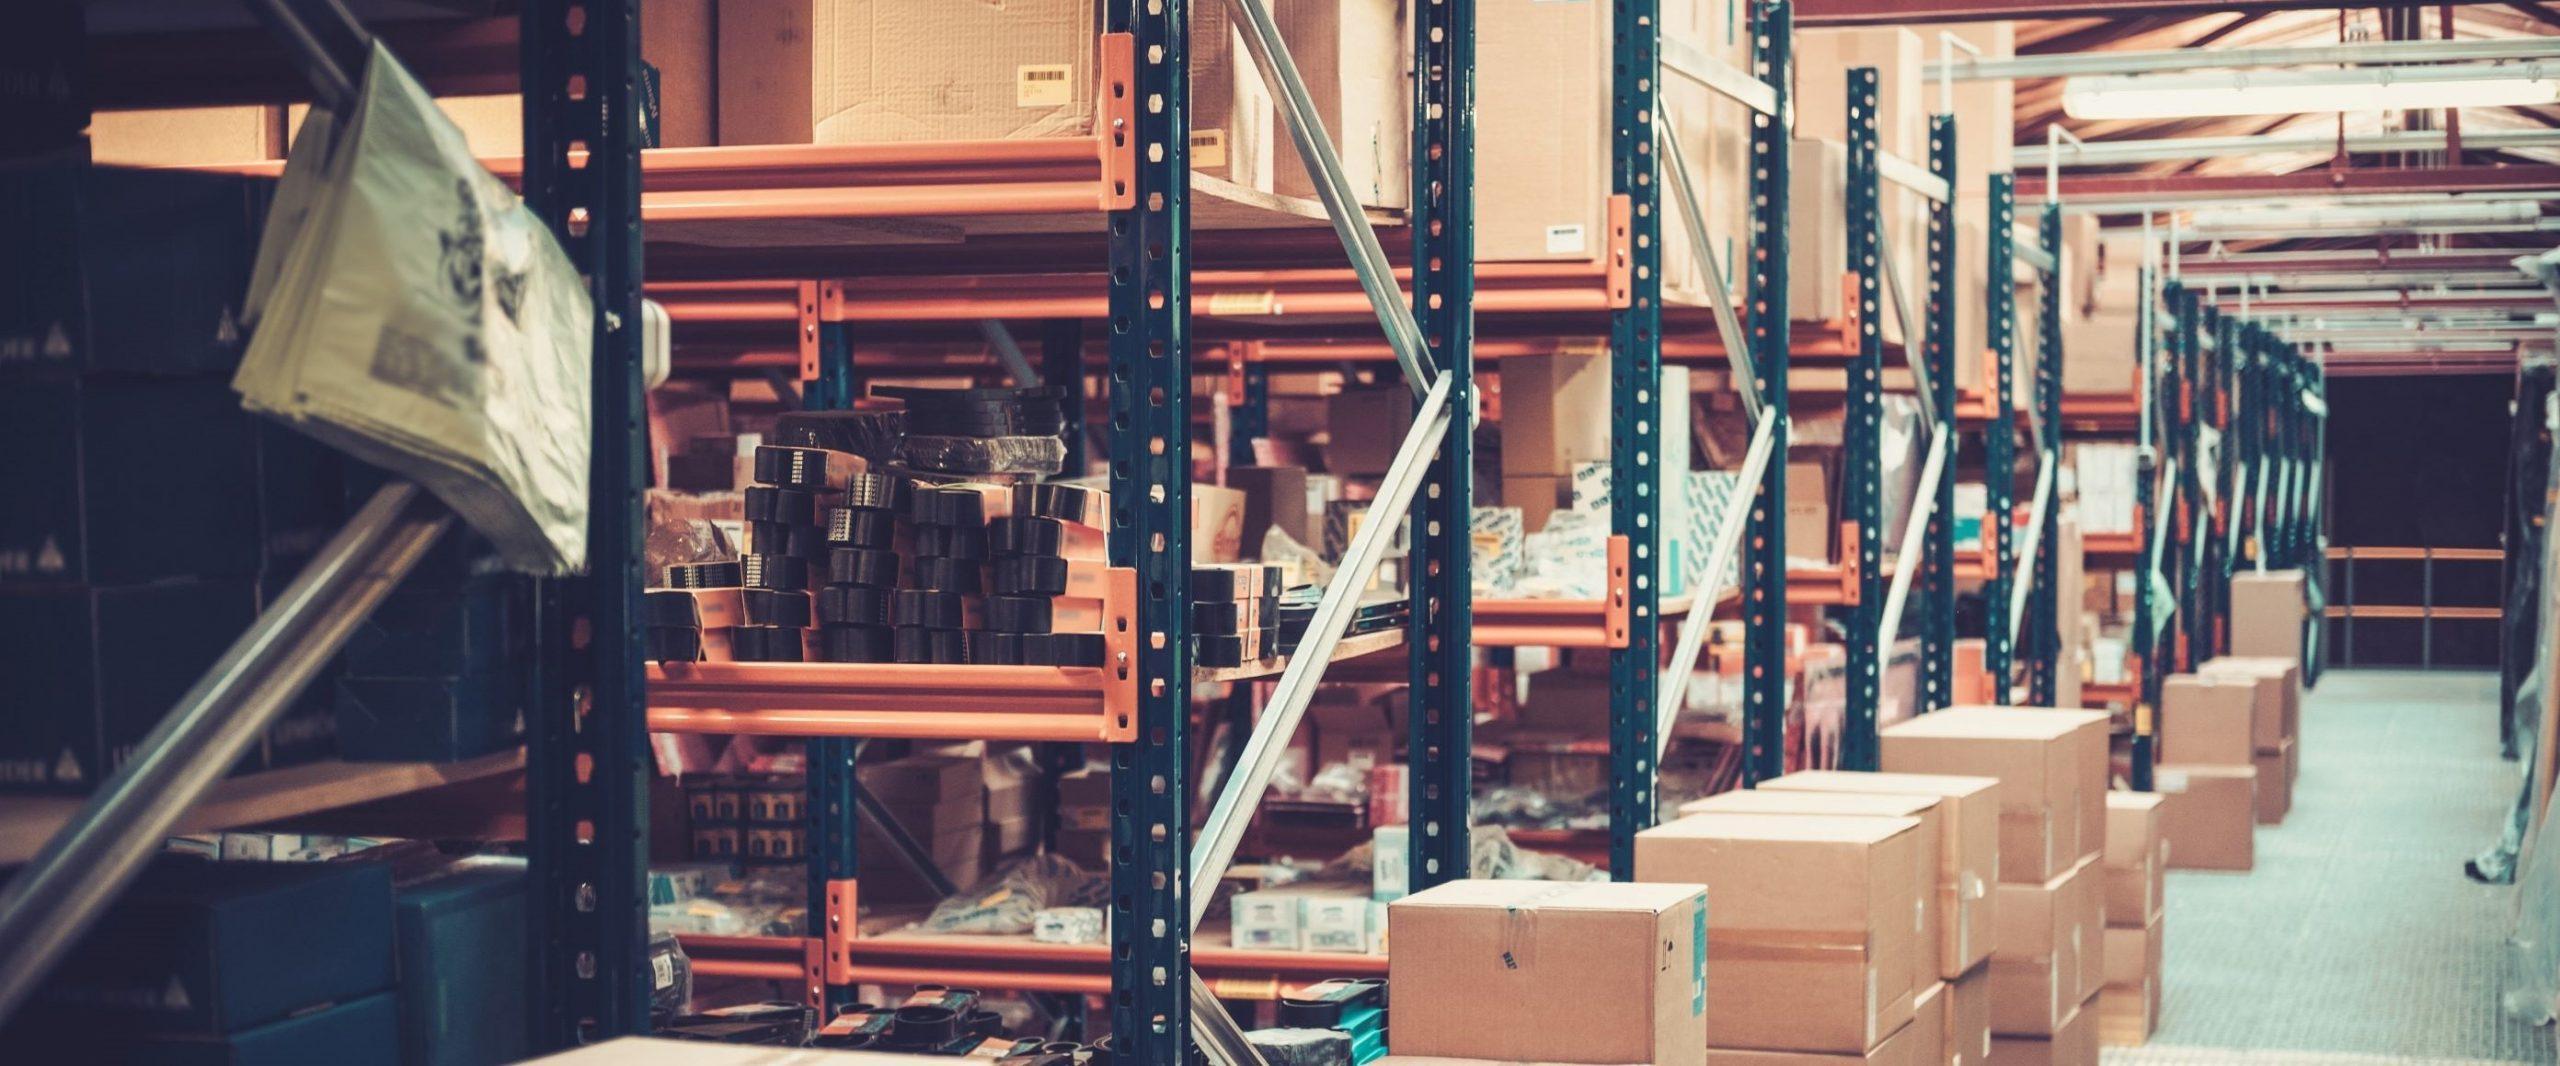 Warehouse_small_0